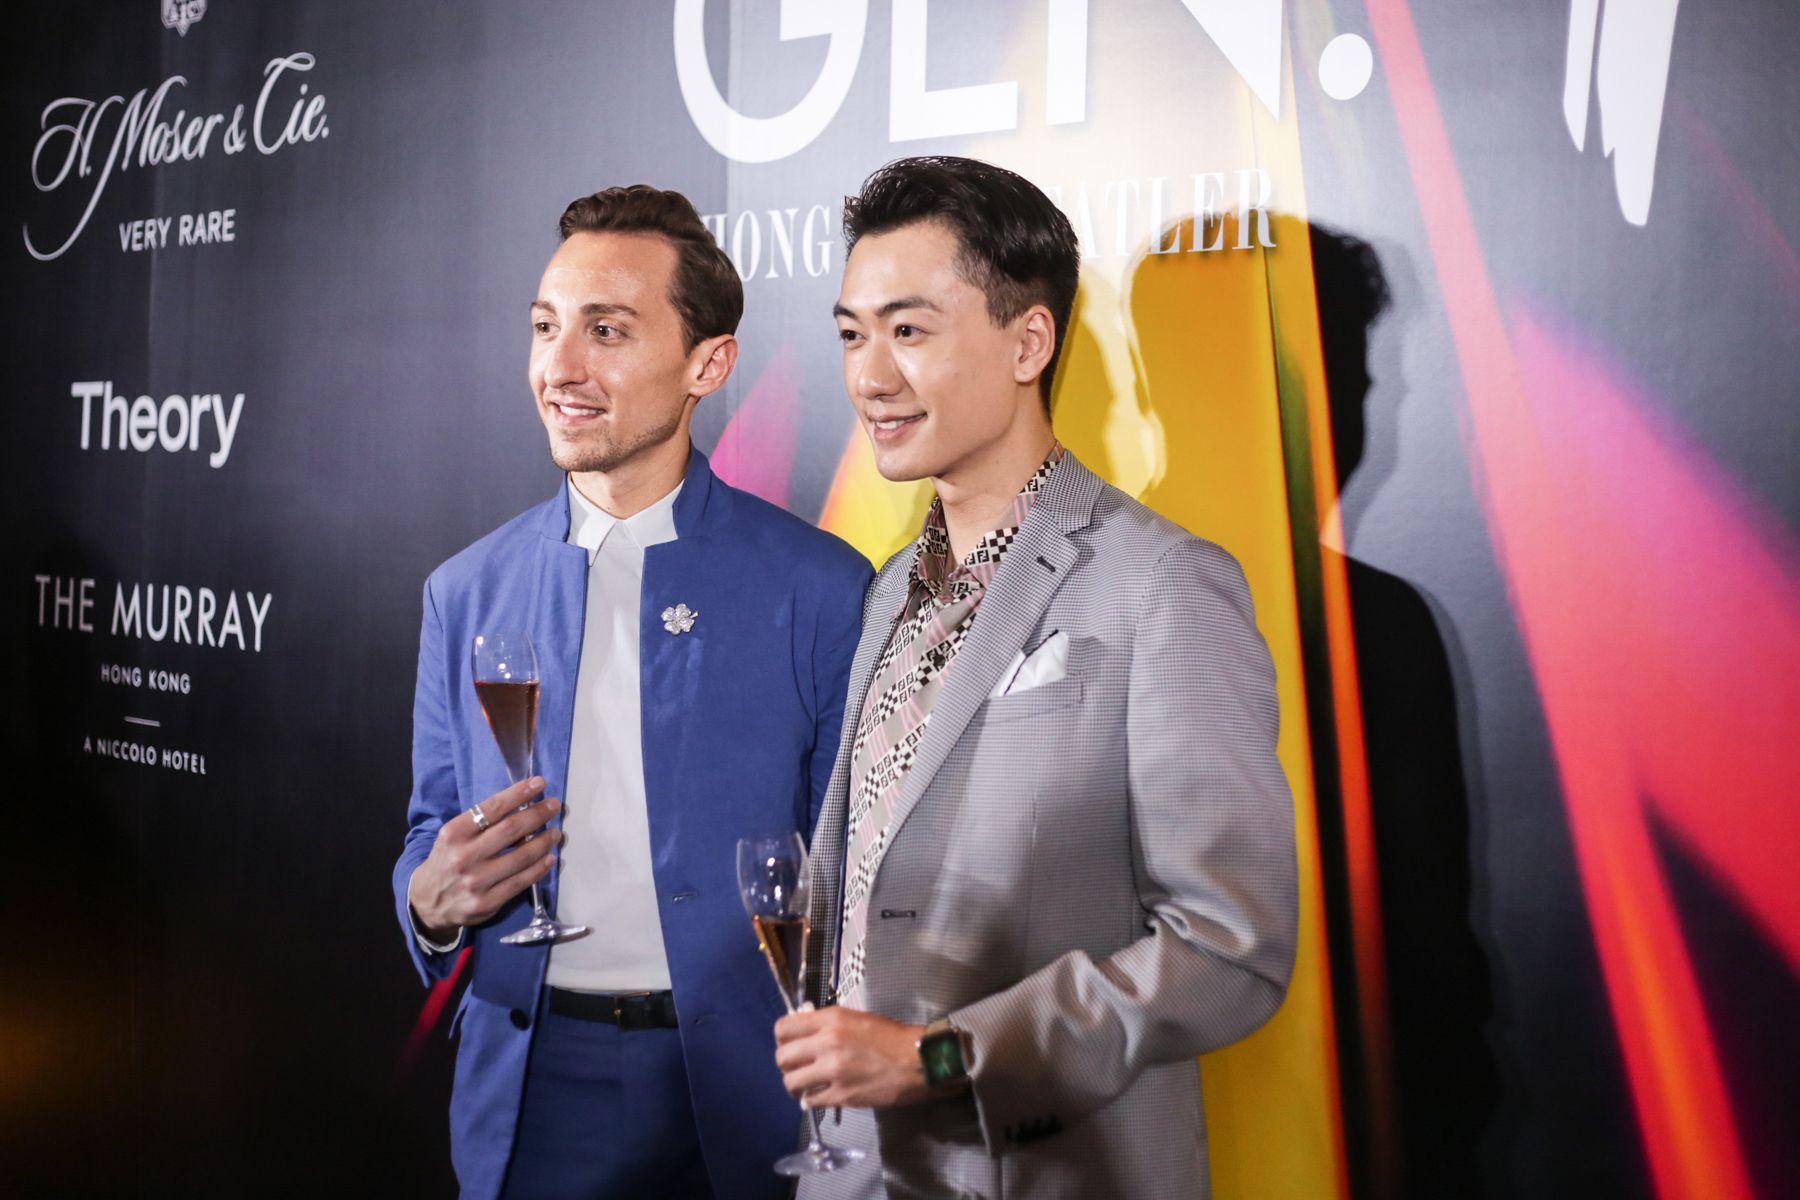 Julien-Loïc Garin, Charles Lam